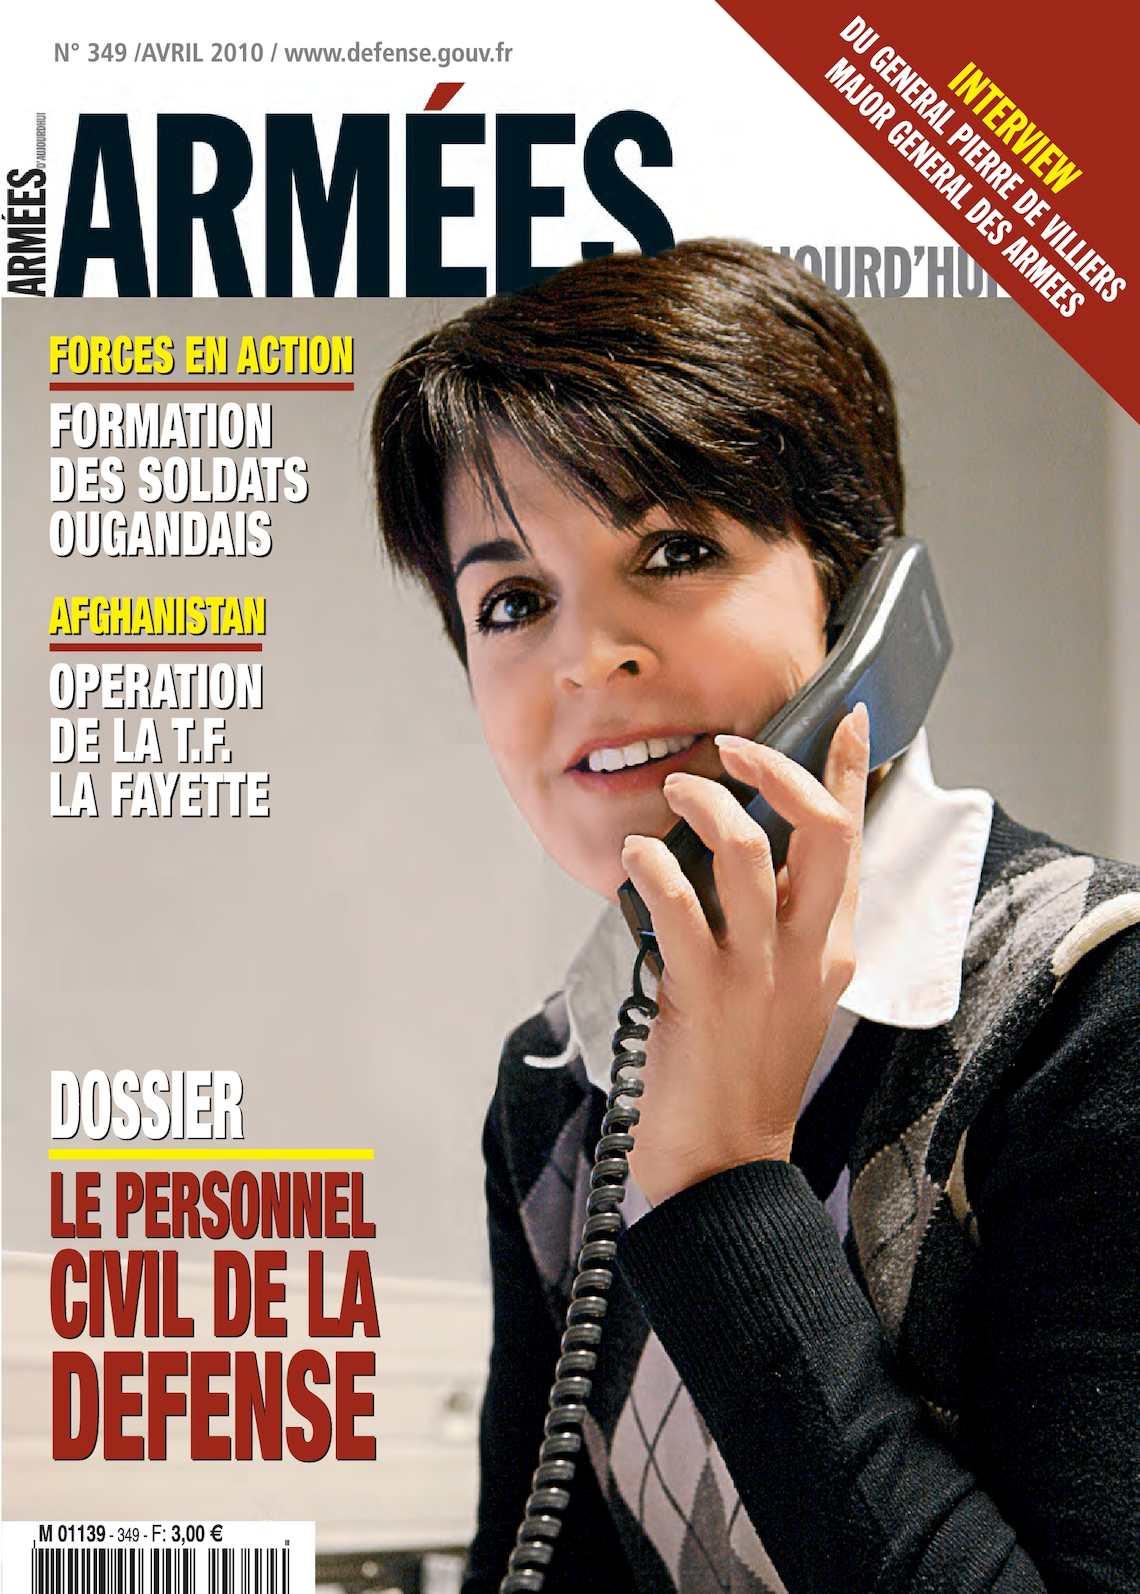 Armées d'Aujourd'hui n° 349 avril 2010